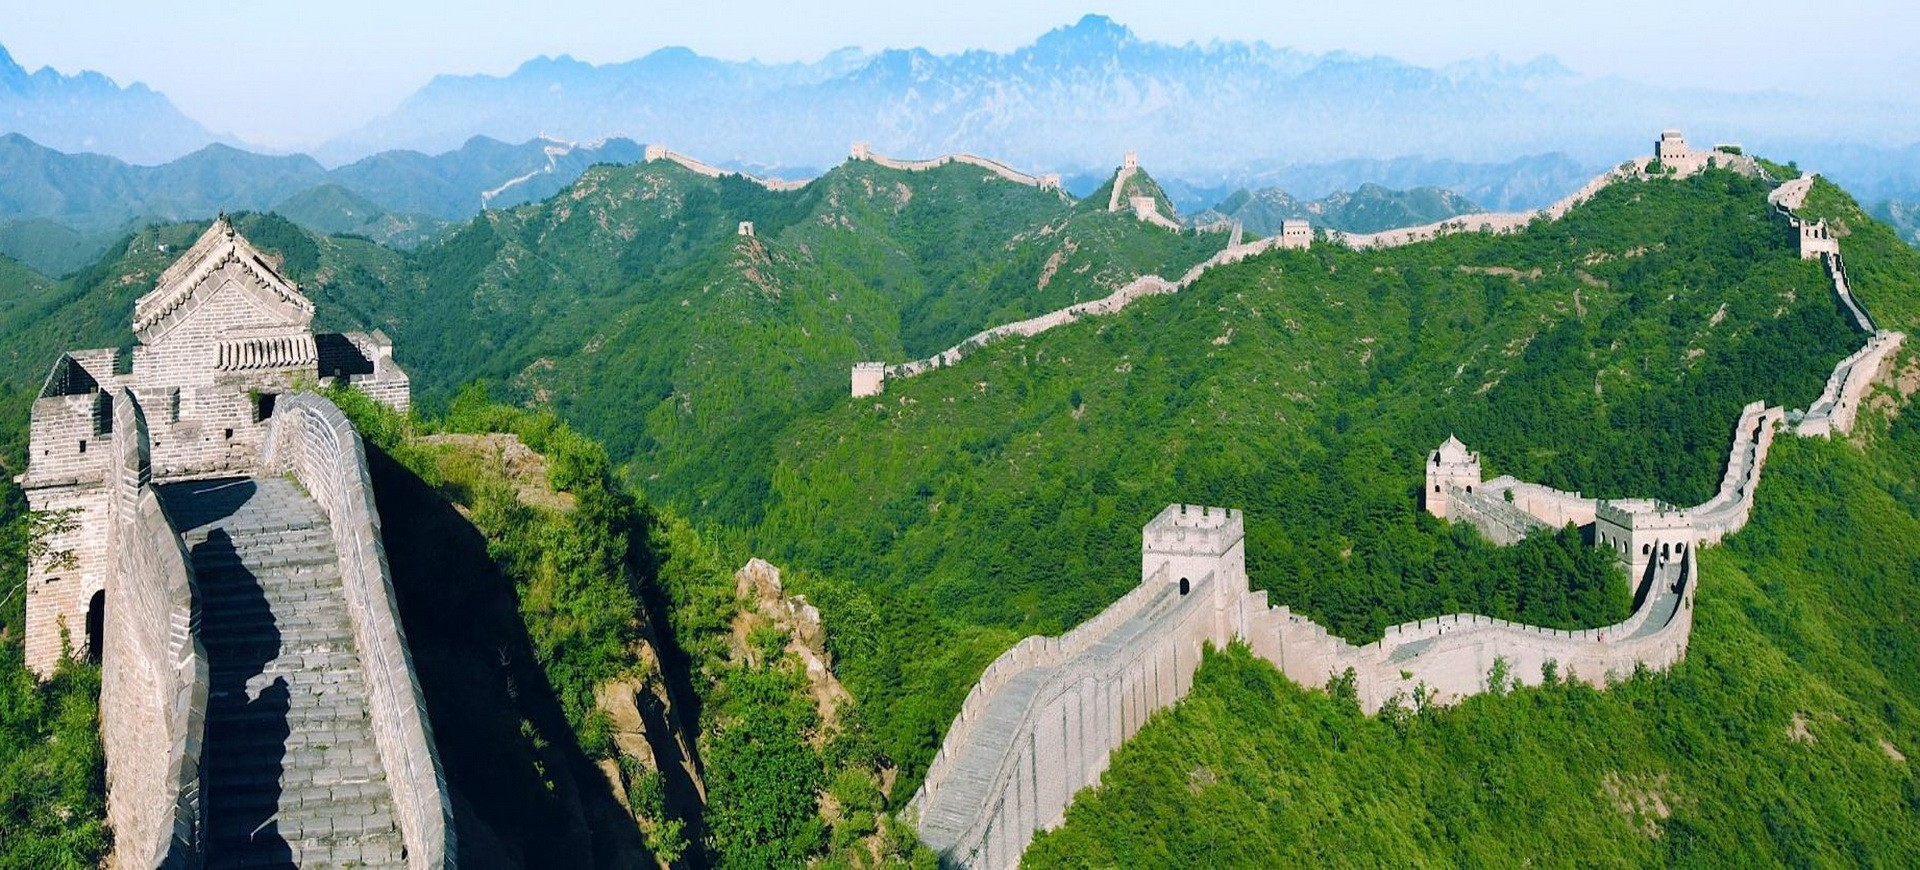 Chine Pékin Beijing Grande Muraille